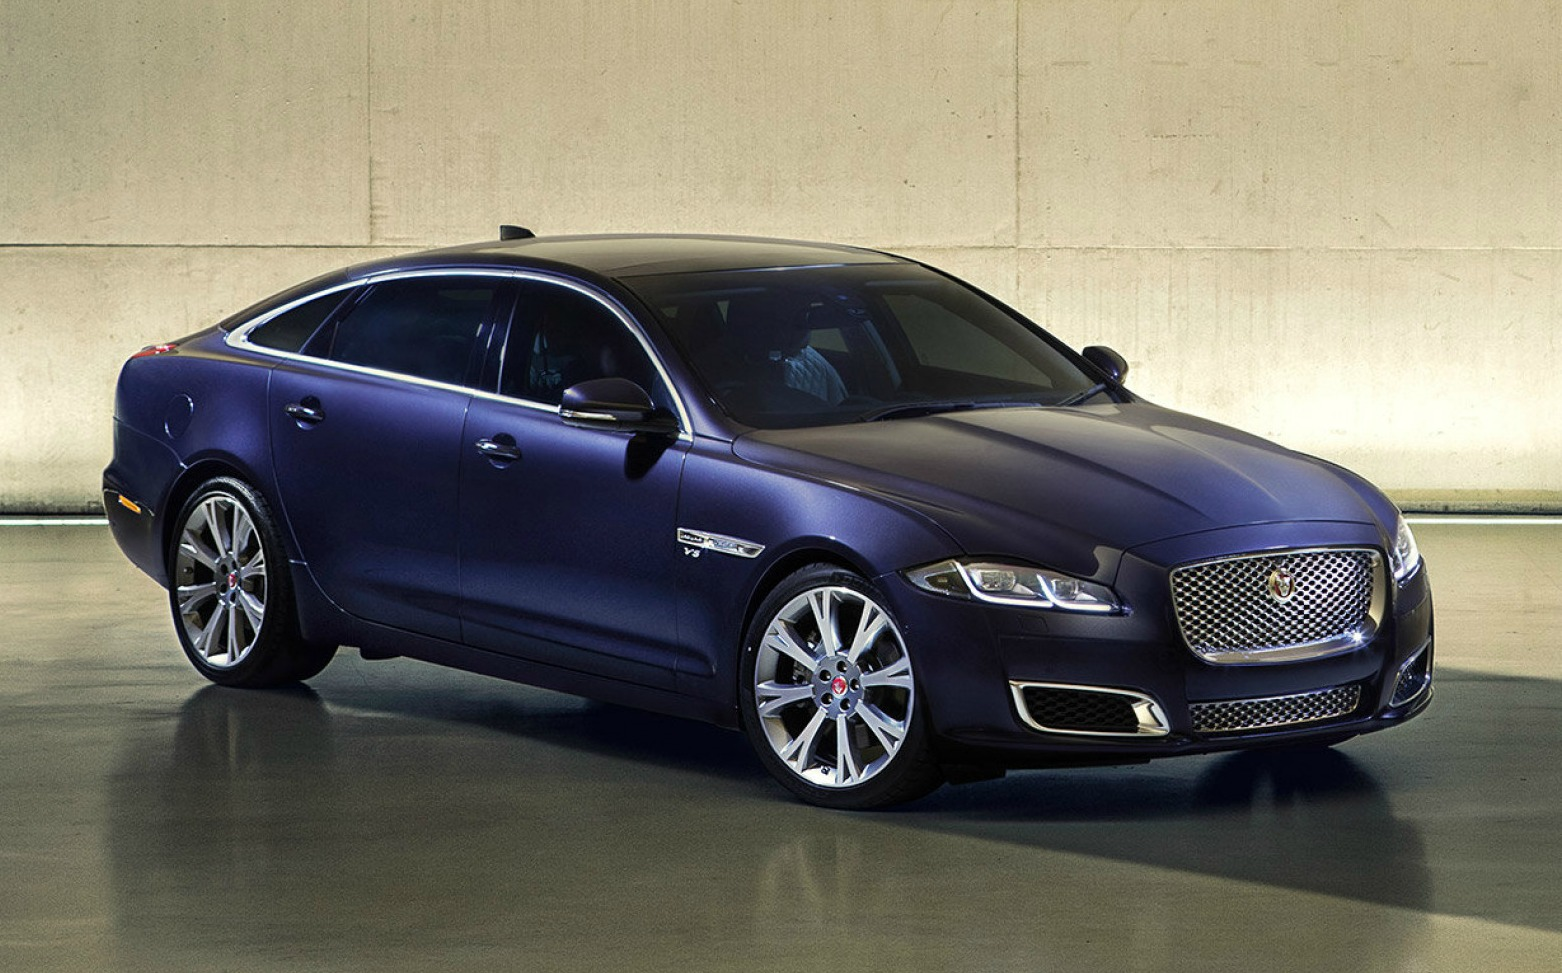 nuova-Jaguar-XJ-elettrica